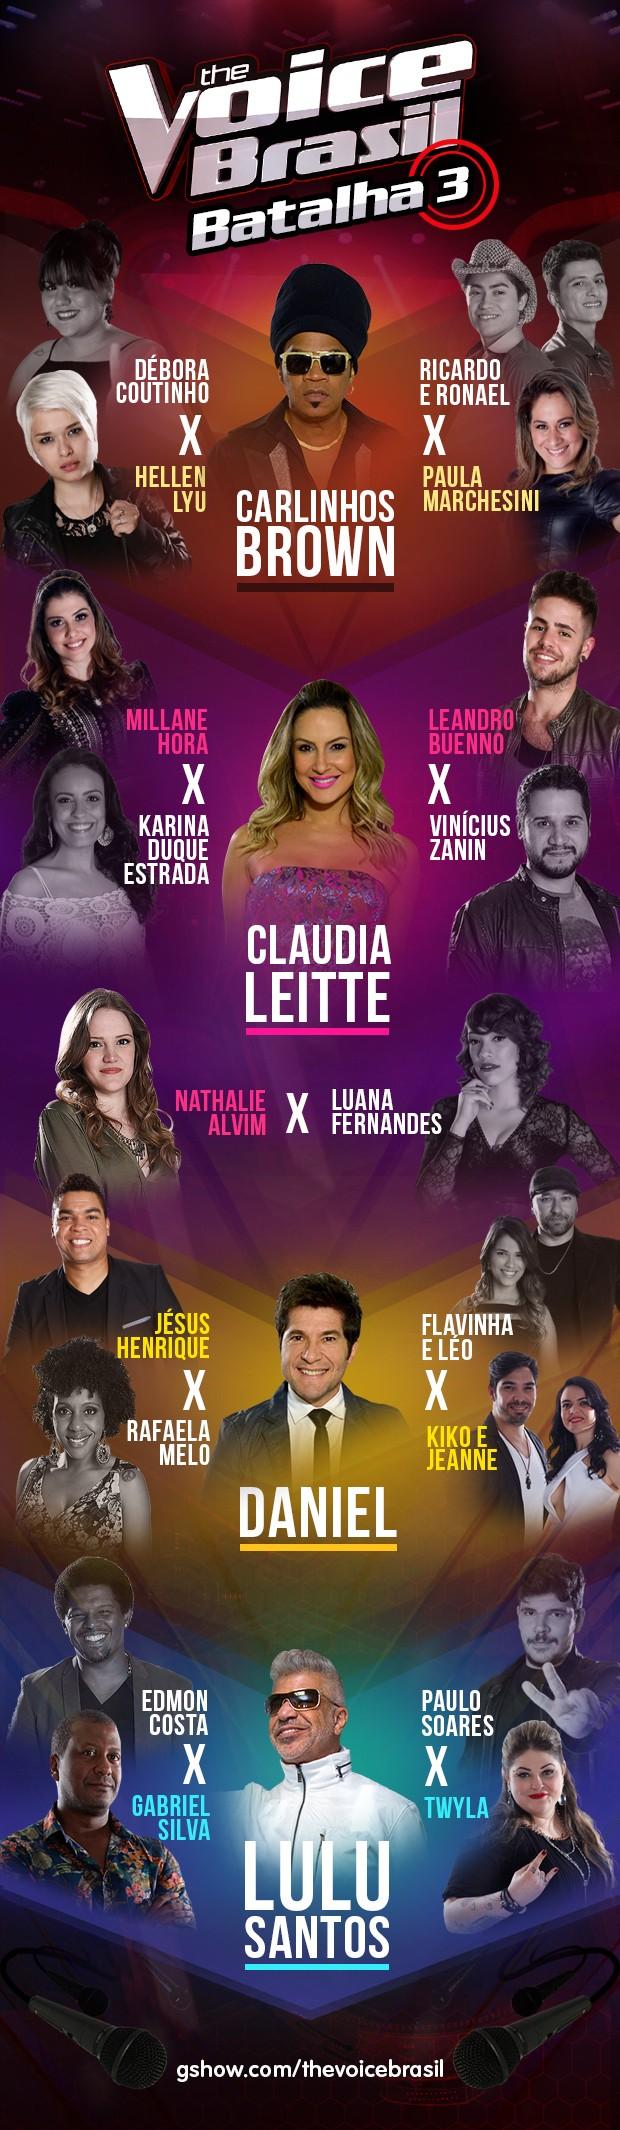 Arte balanço batalhas 3 (Foto: The Voice Brasil)